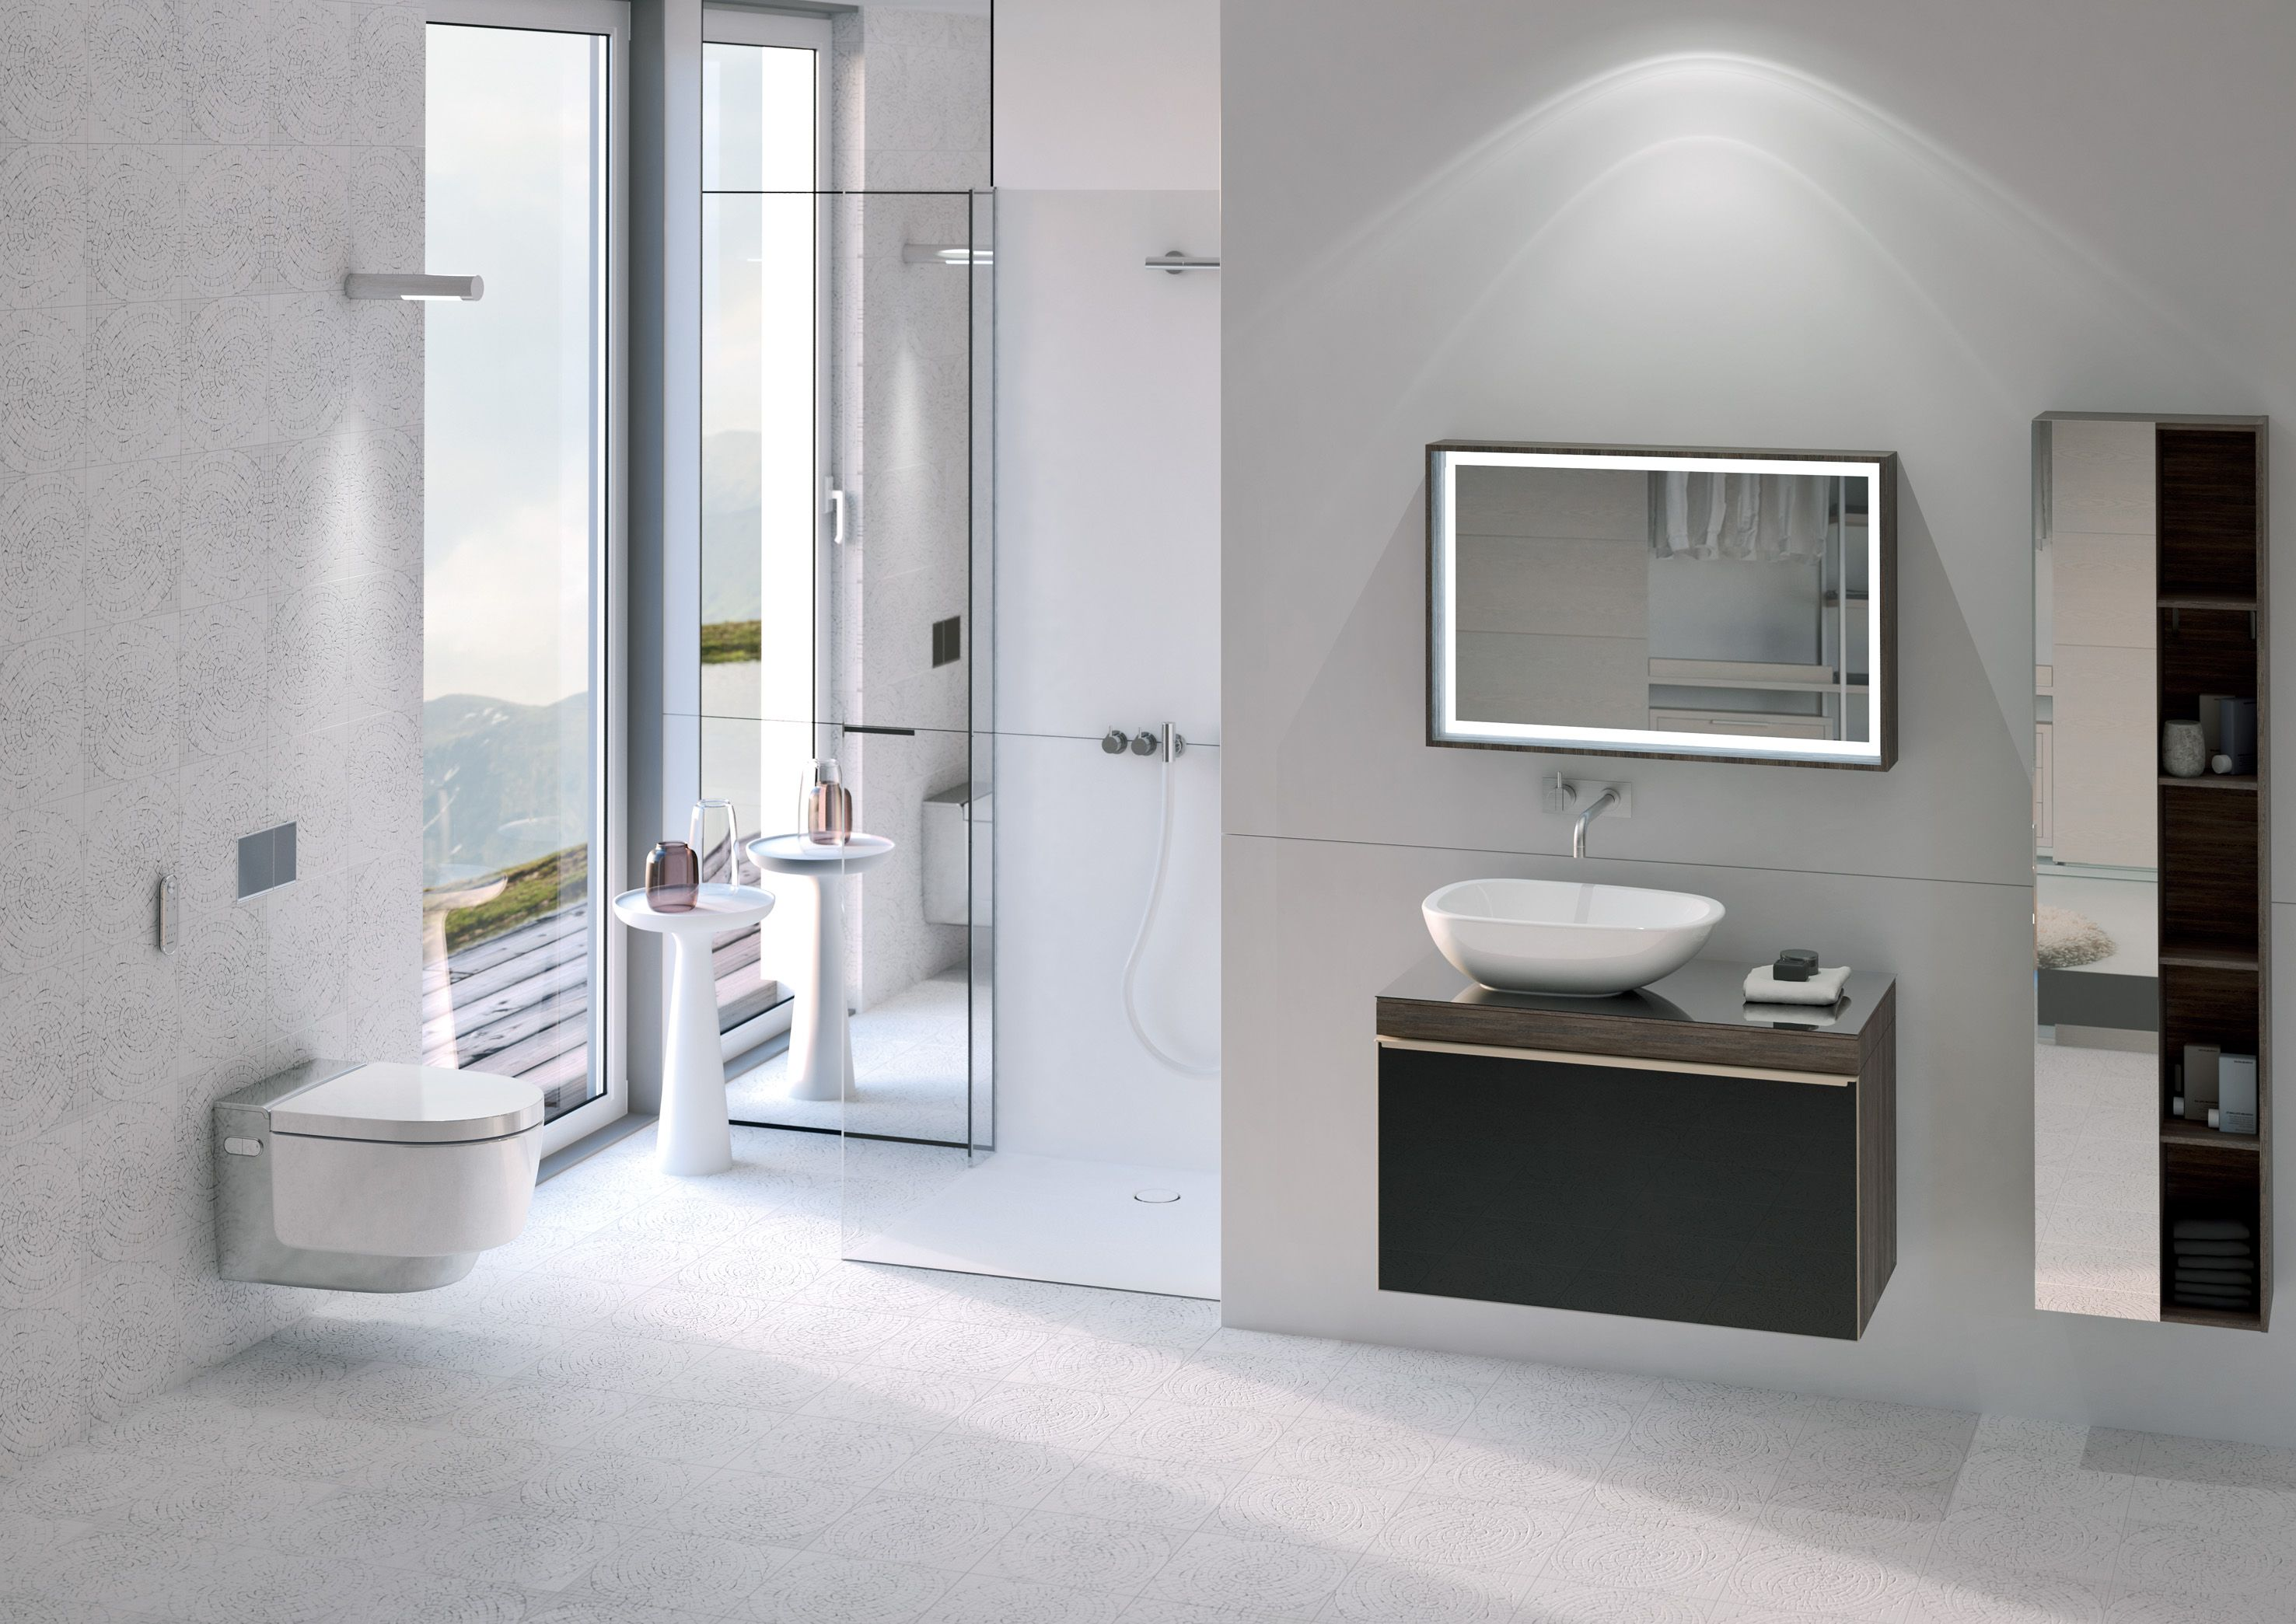 Geberit Aquaclean Mera classic douche wc badkamer design | 1. Bidet ...